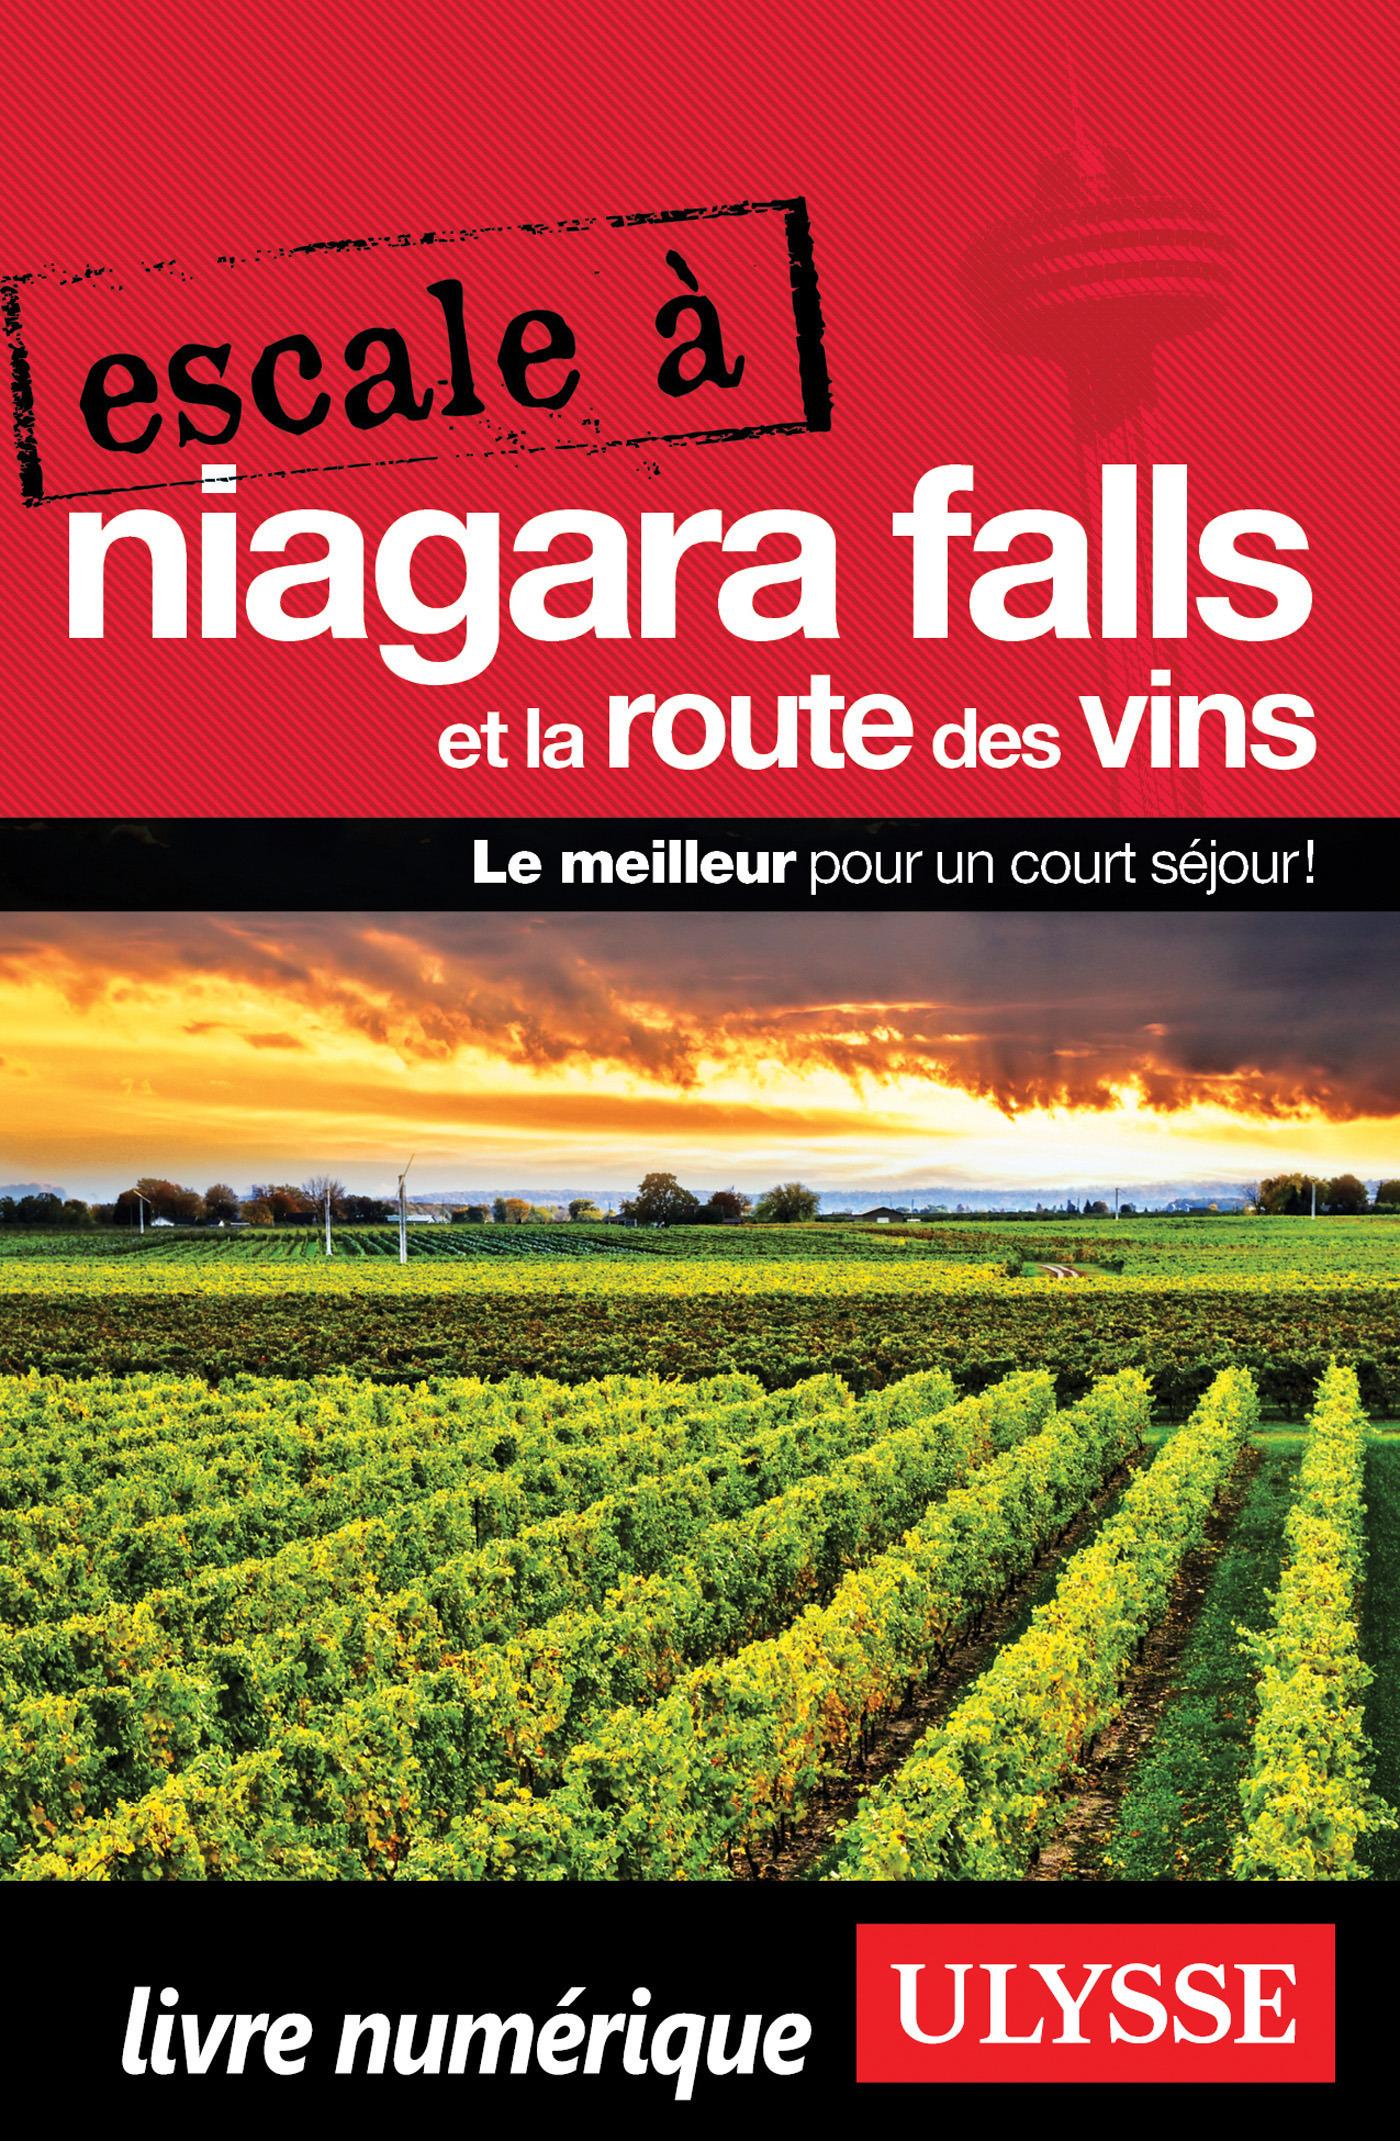 Escale à Niagara Falls et la Route des vins (ebook)